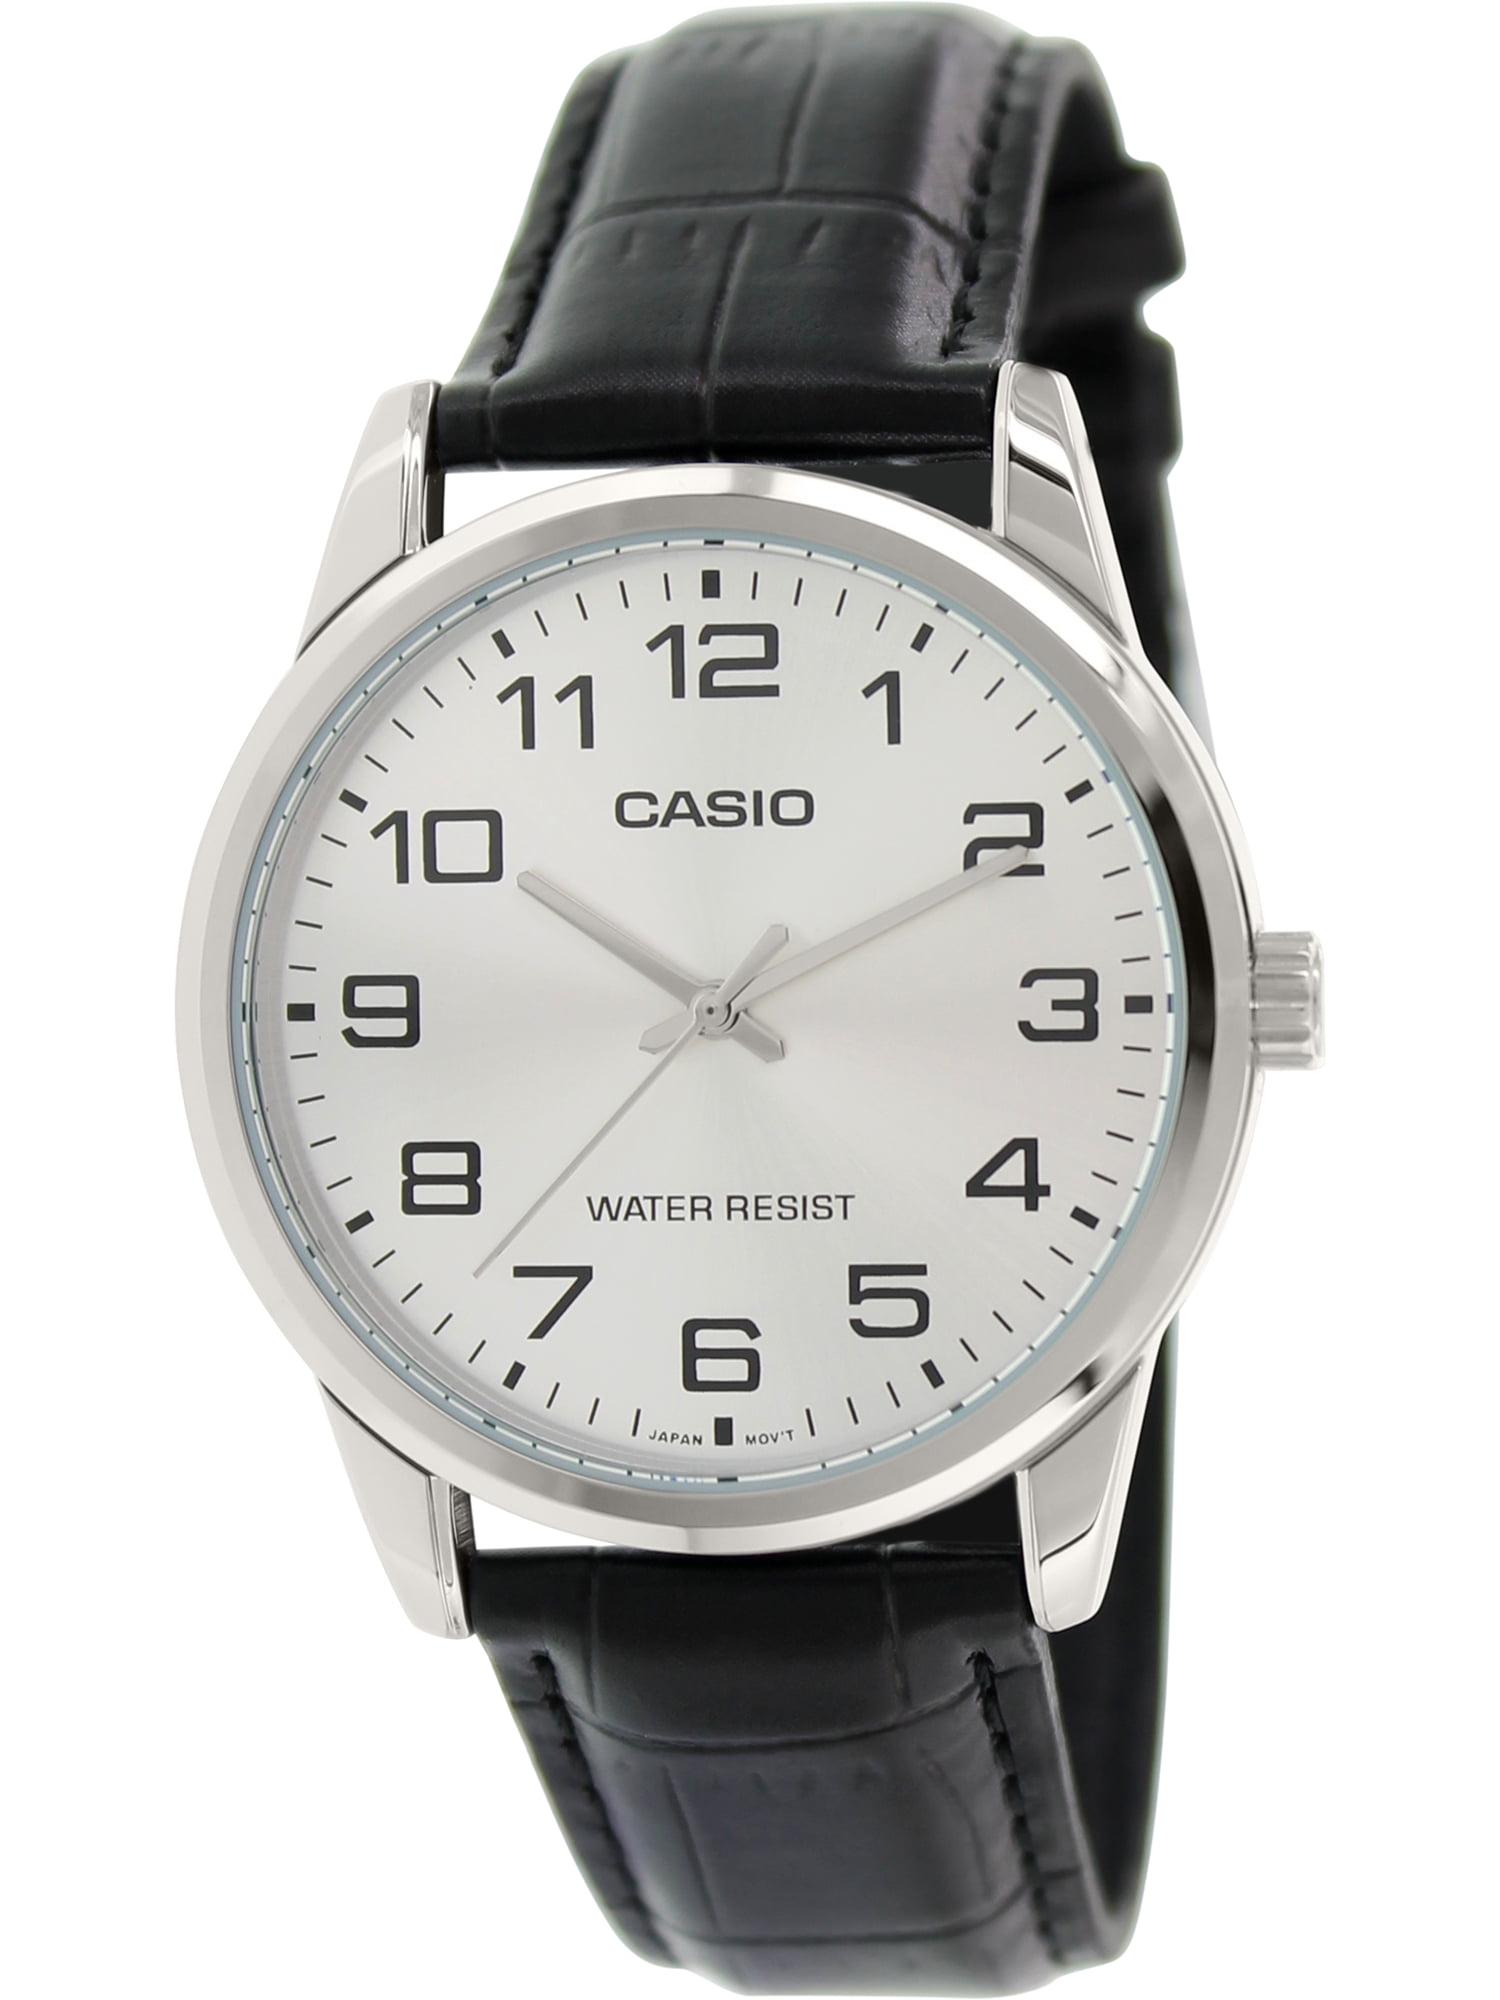 Men's MTPV001L-7B Black Leather Quartz Fashion Watch